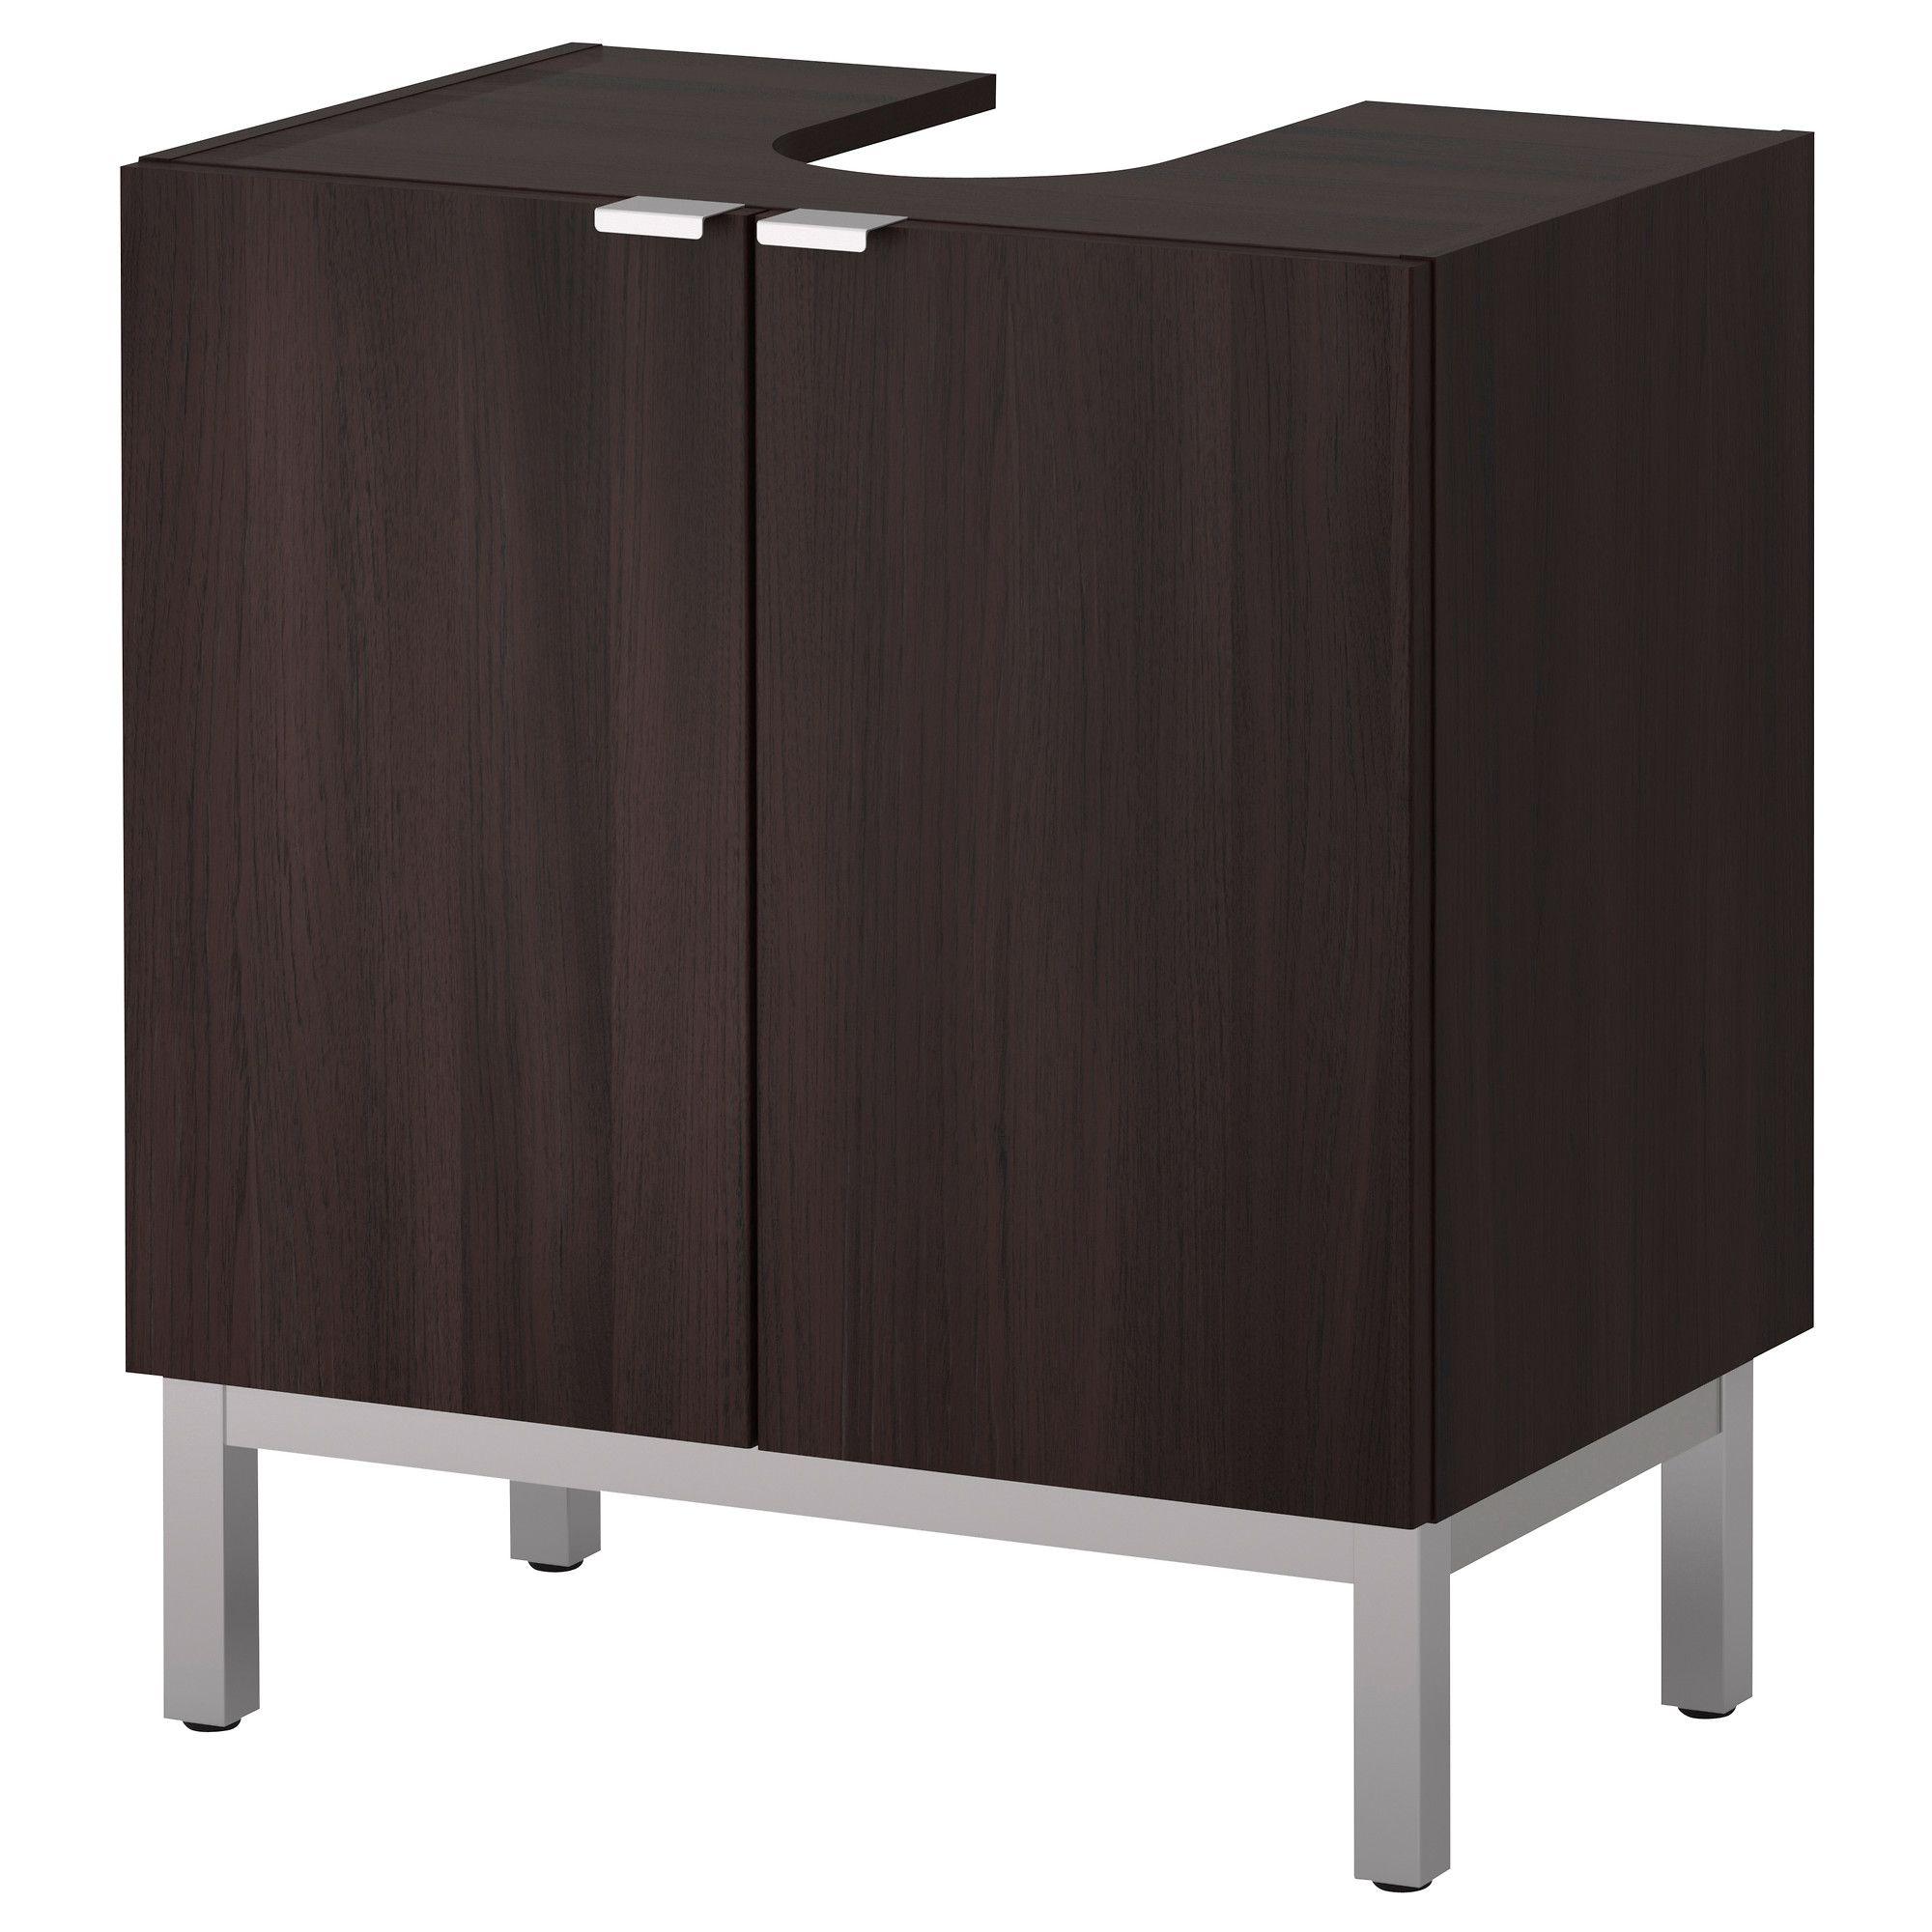 Us Furniture And Home Furnishings Base Cabinets Ikea Cabinet